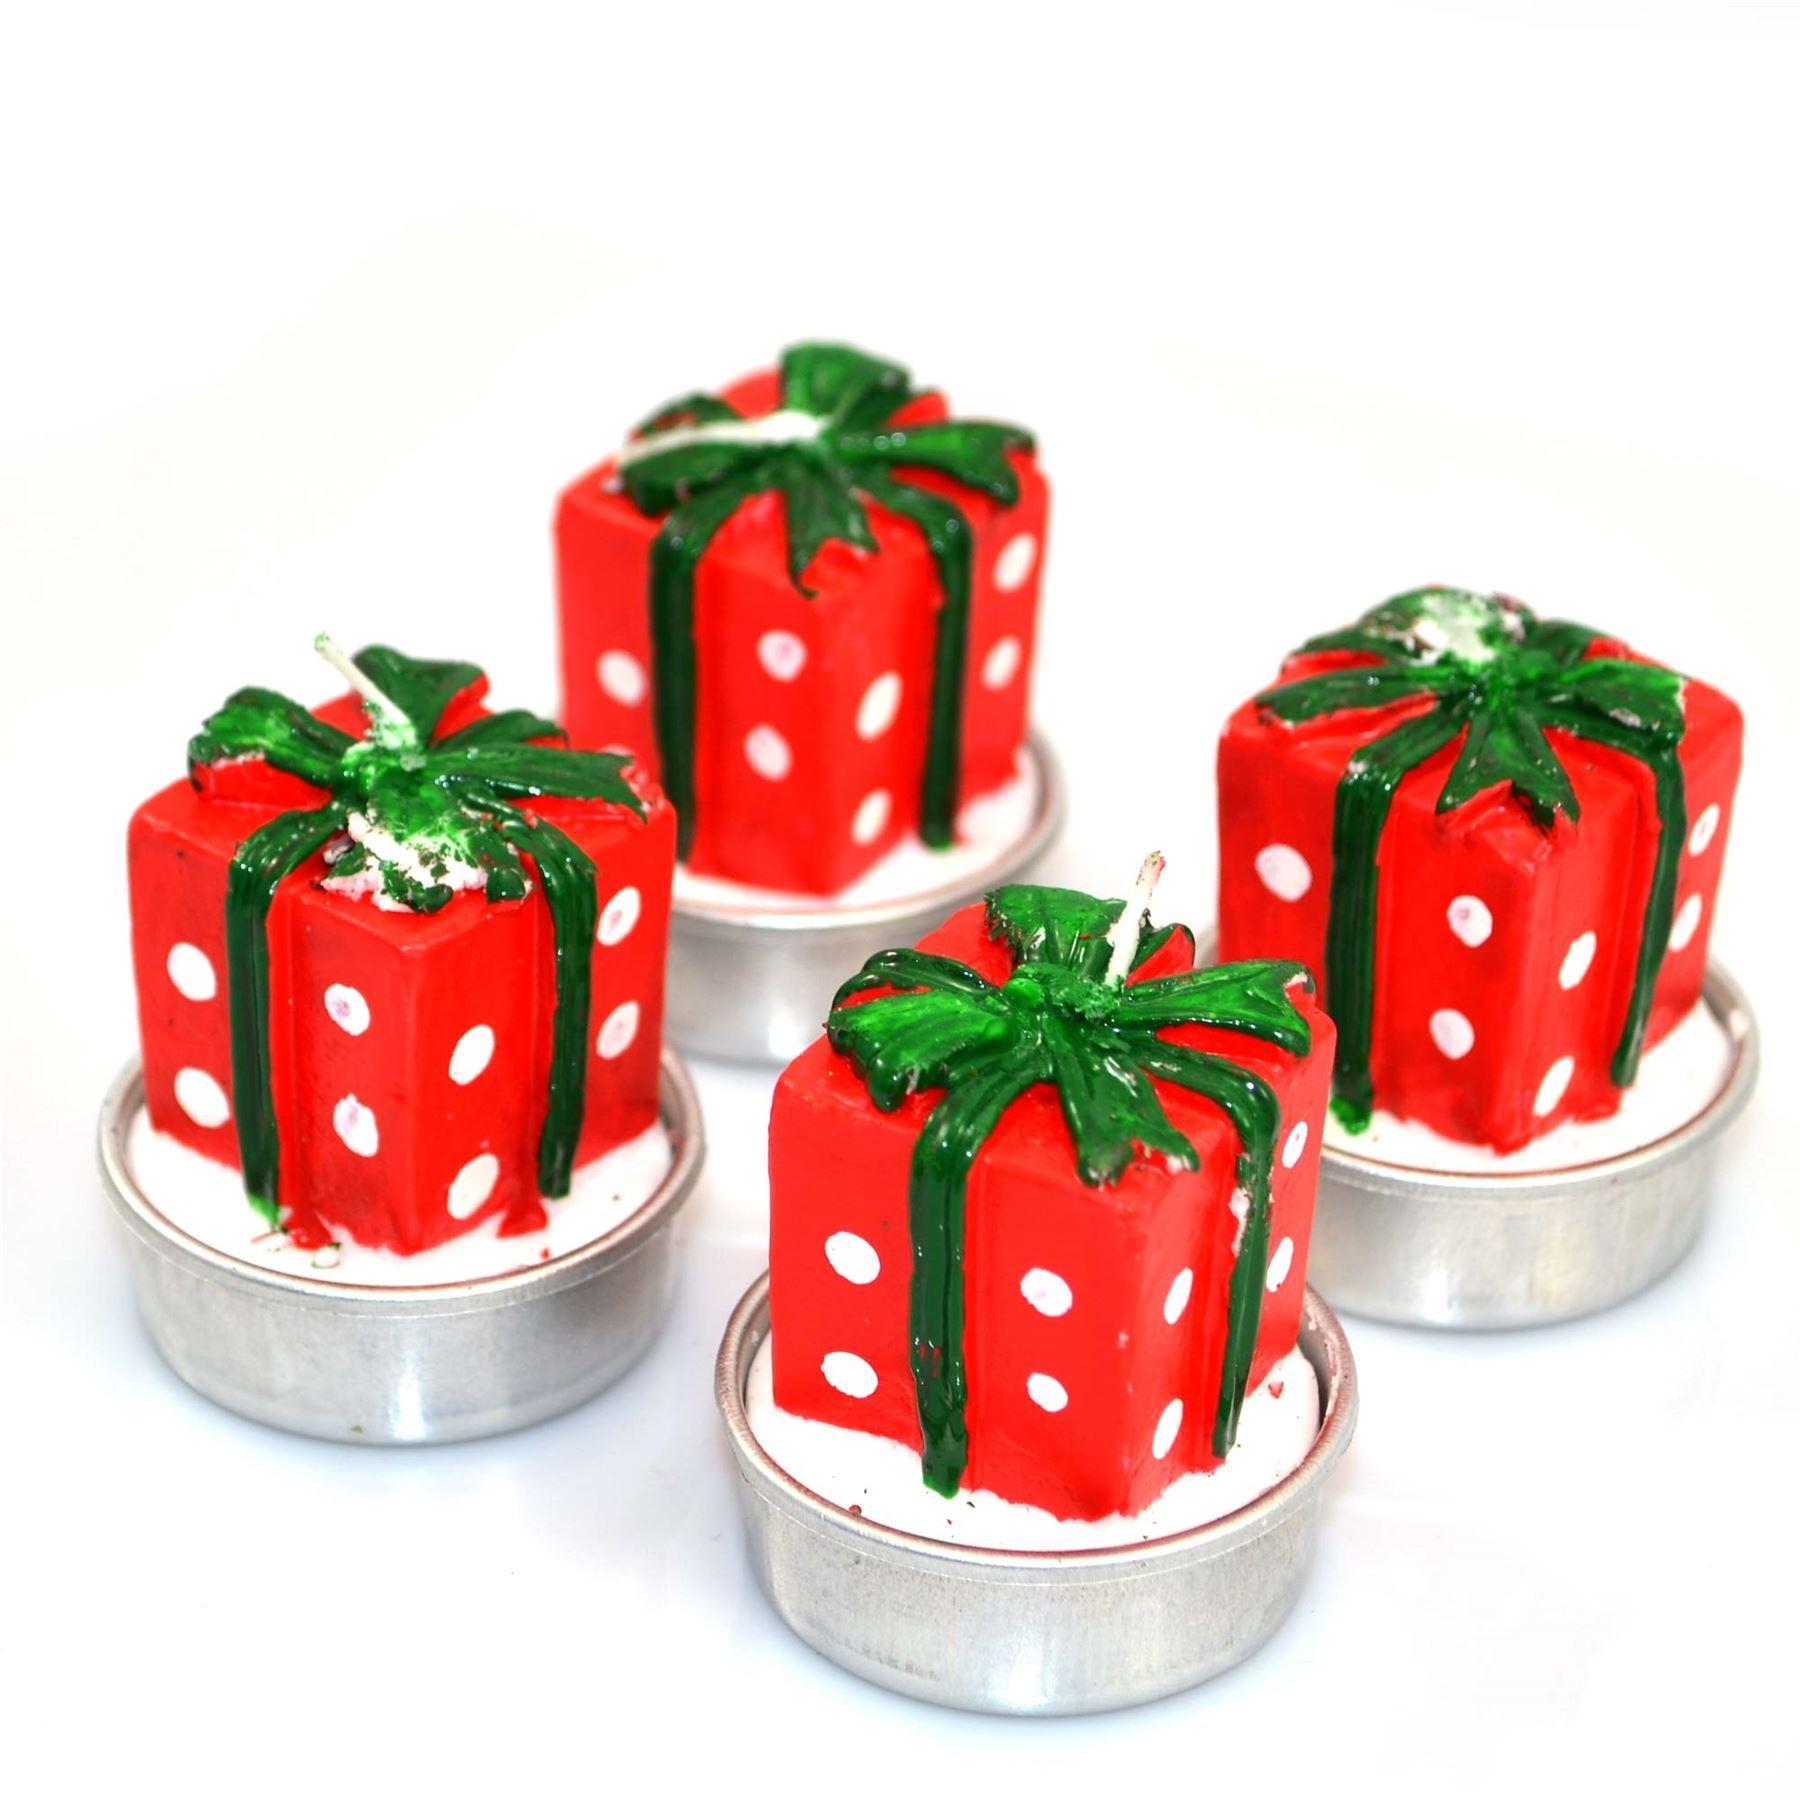 Christmas Decorative Novelty Candles Natural 4 Candle Set